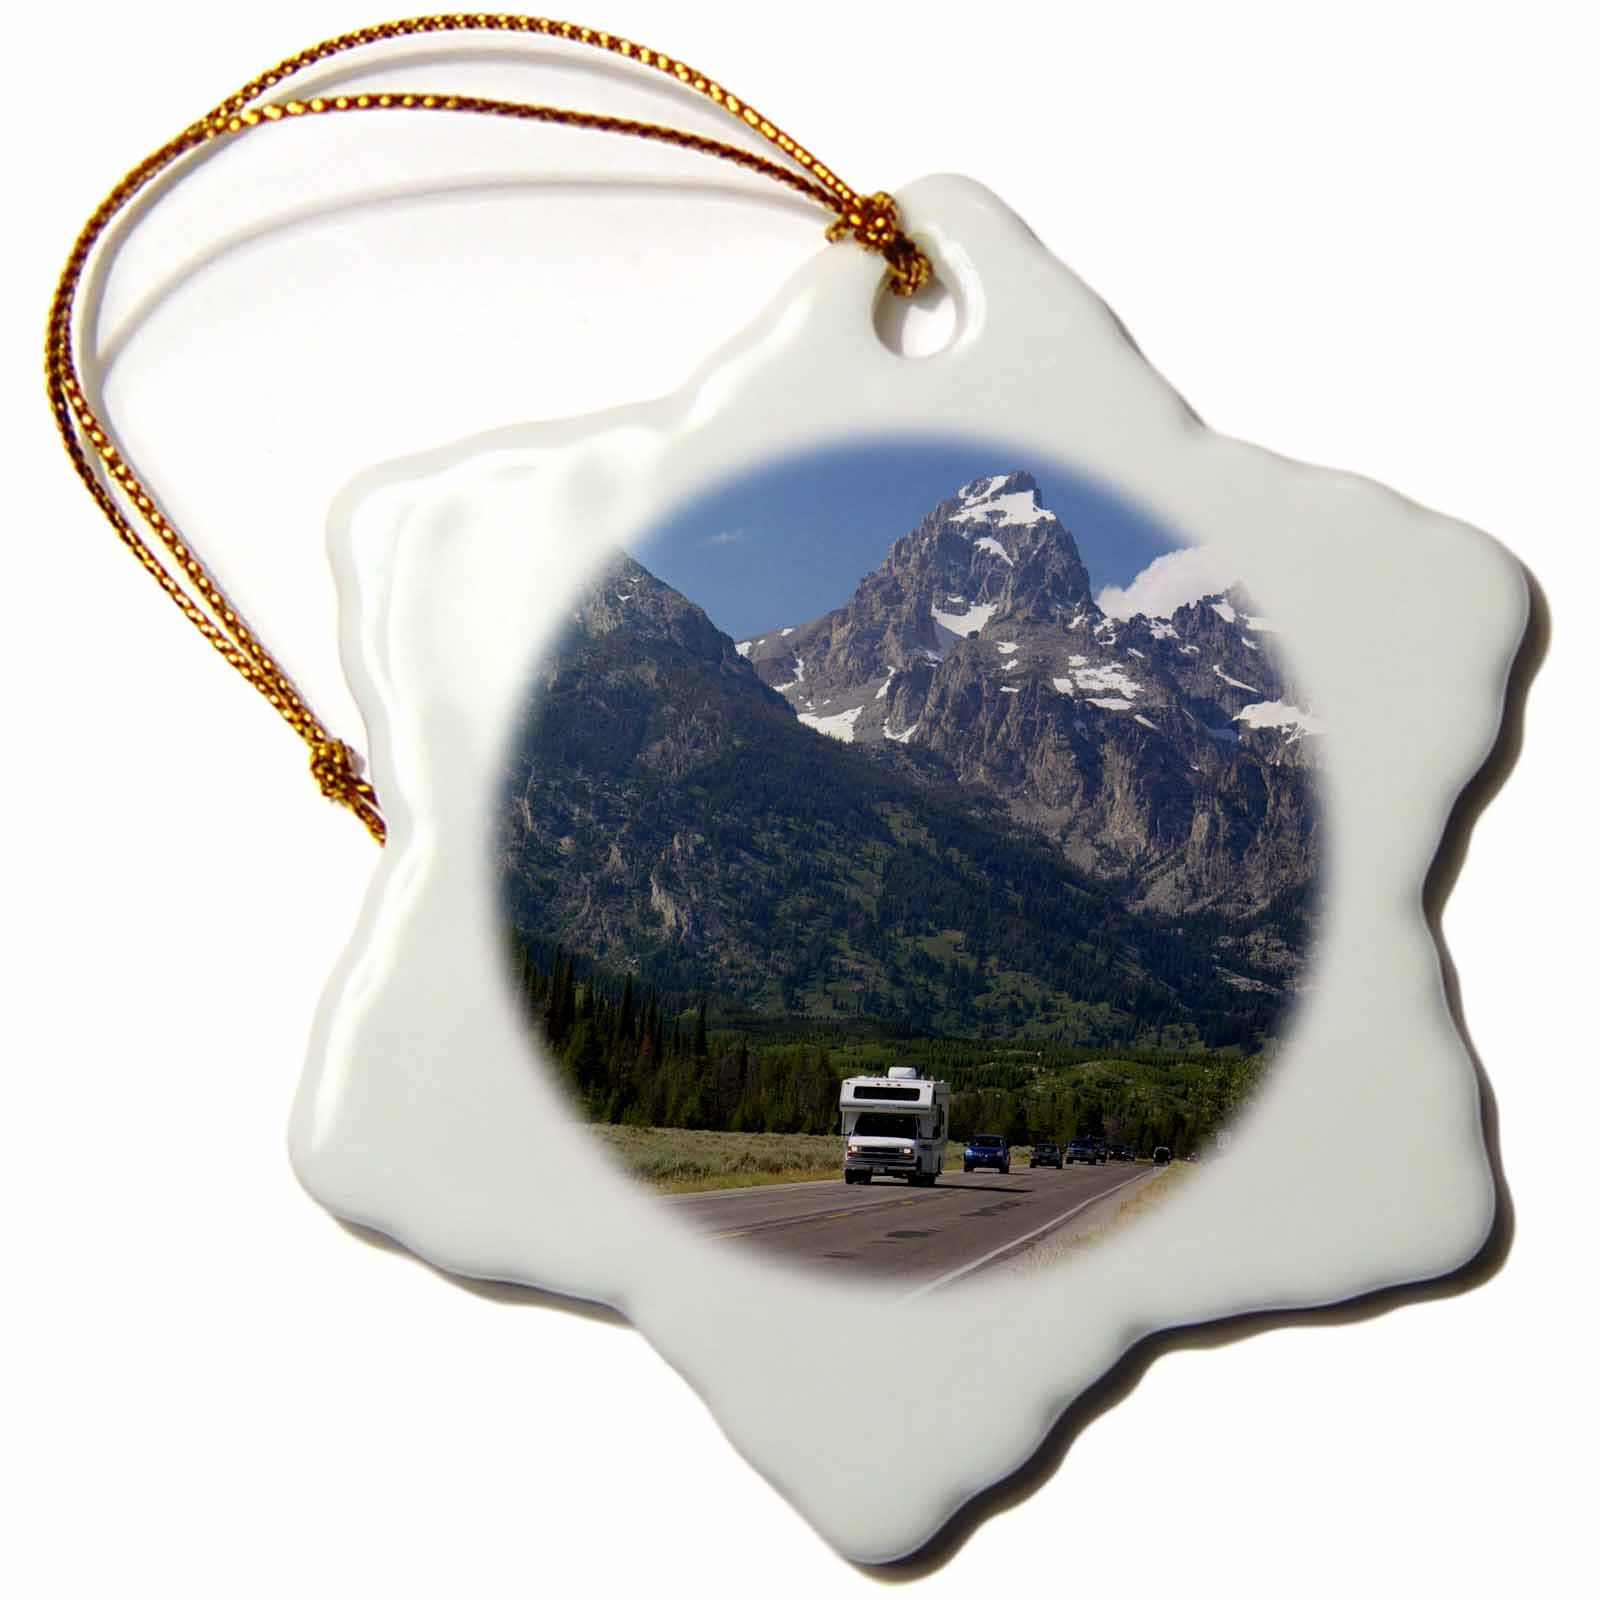 3dRose orn_148941_1 Travel, Grand Teton National Park, Wyoming, Usa Us51 Dfr0149 David R. Frazier Snowflake Ornament, Porcelain, 3-Inch